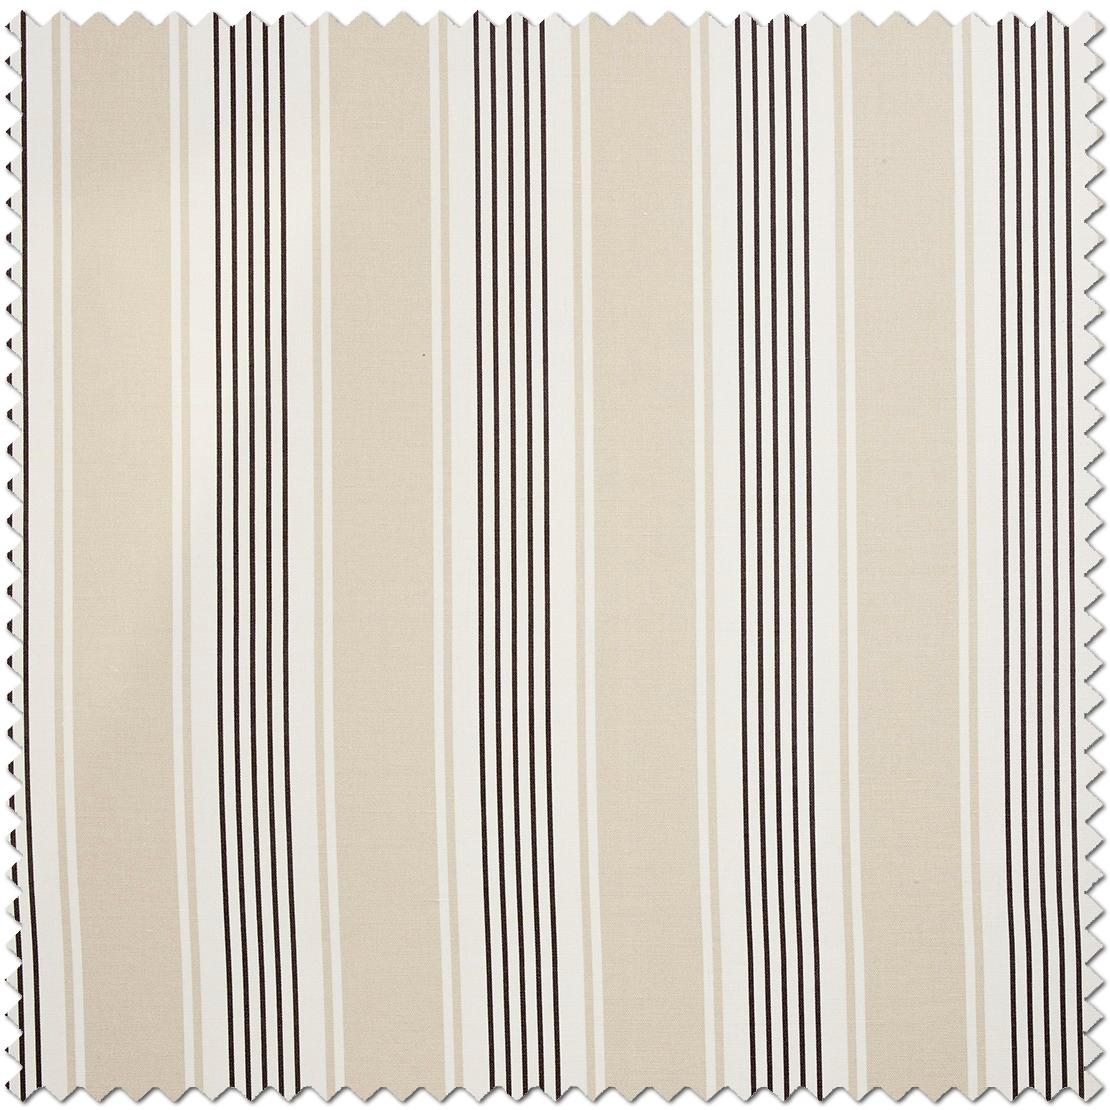 Tissu Rayures noire  - Collection Chantilly de Casadéco